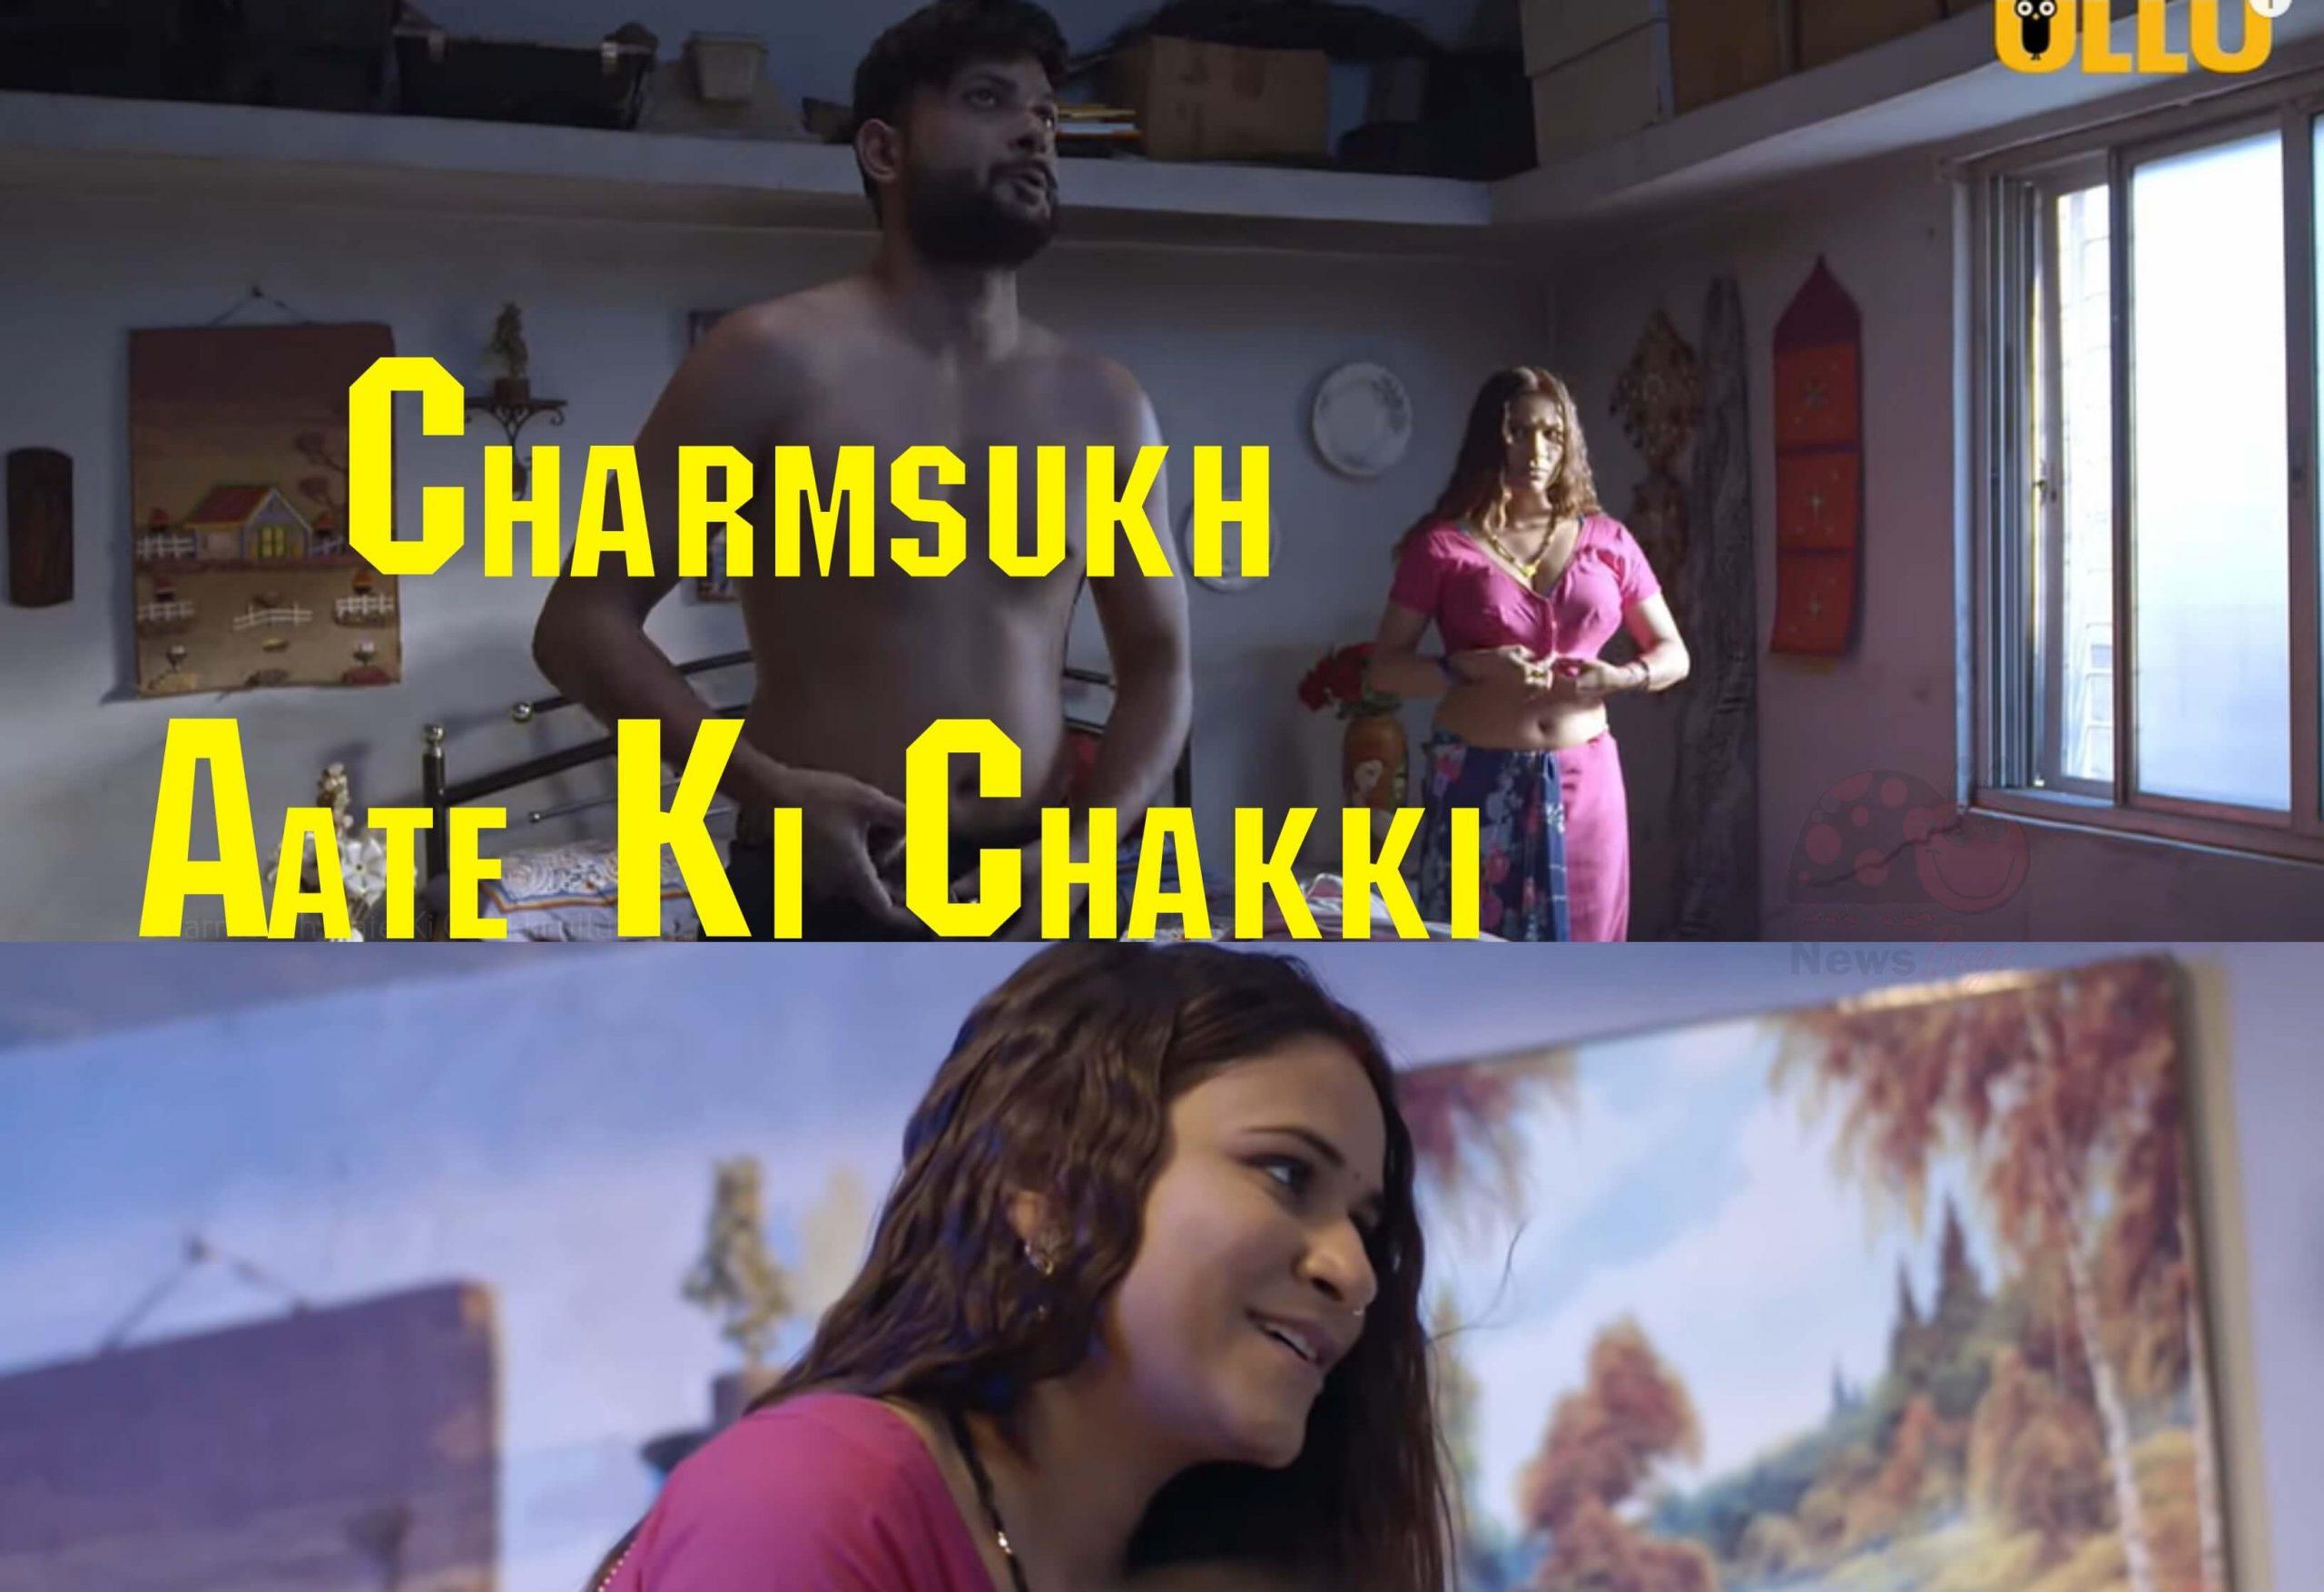 Charmsukh Aate Ki Chakki Ullu